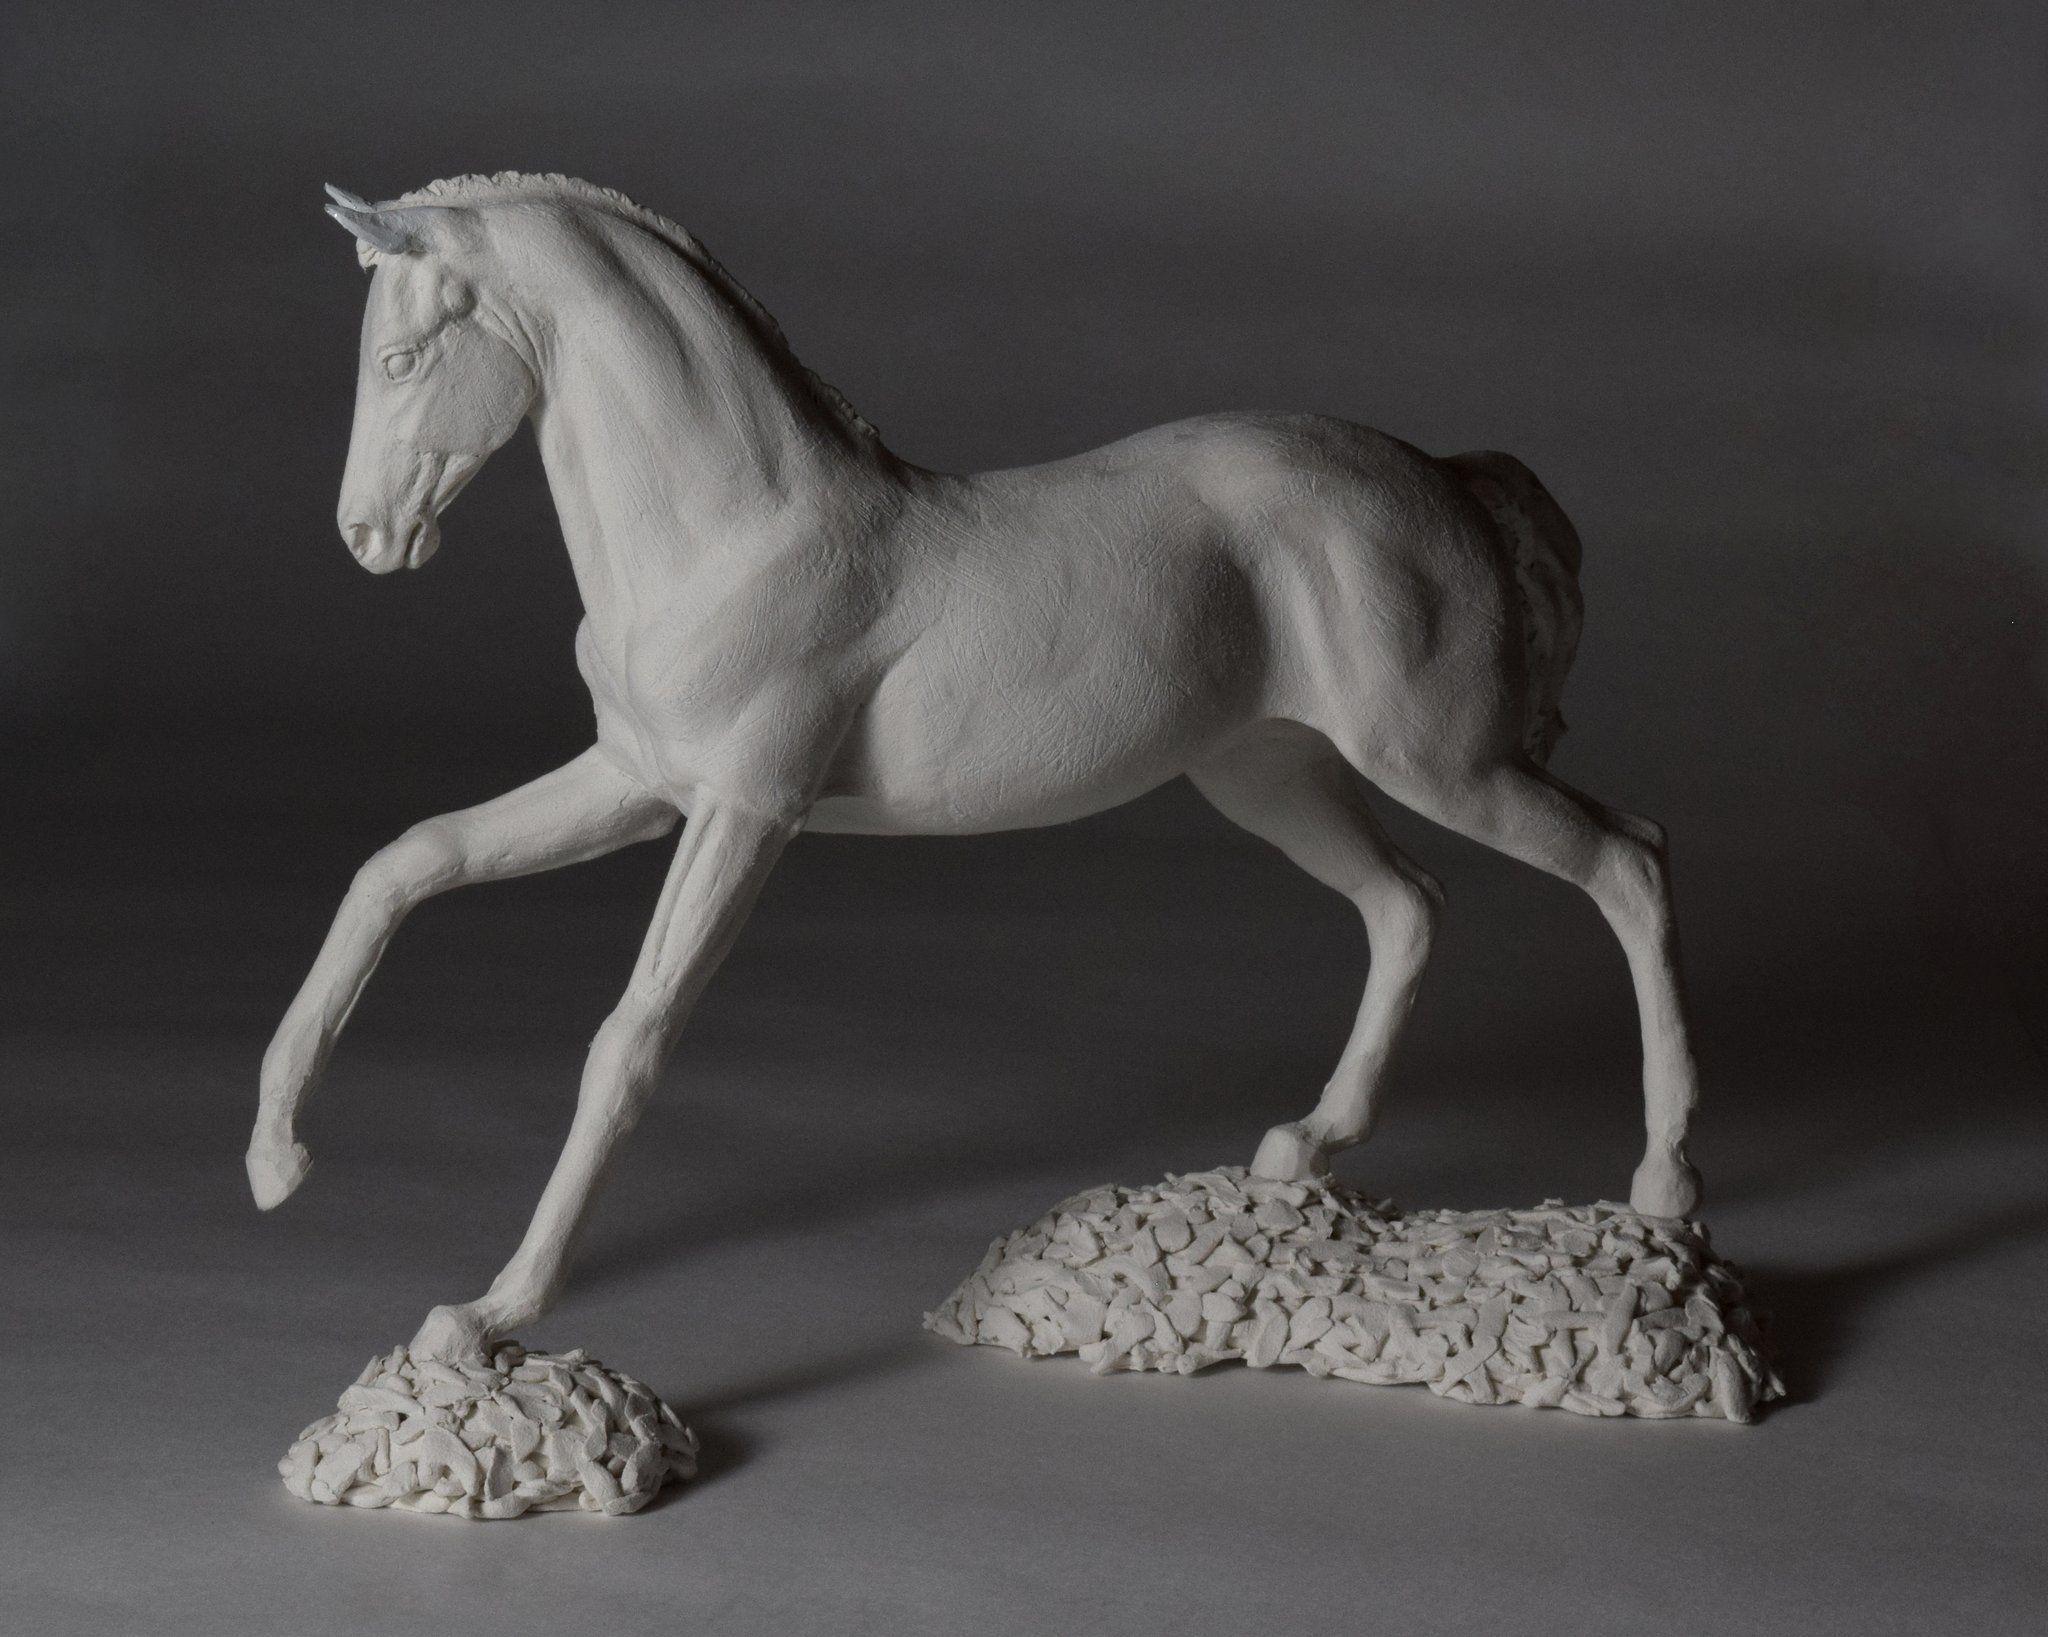 Sculpting Horses in Air Dry Clay Book Air dry clay, Dry